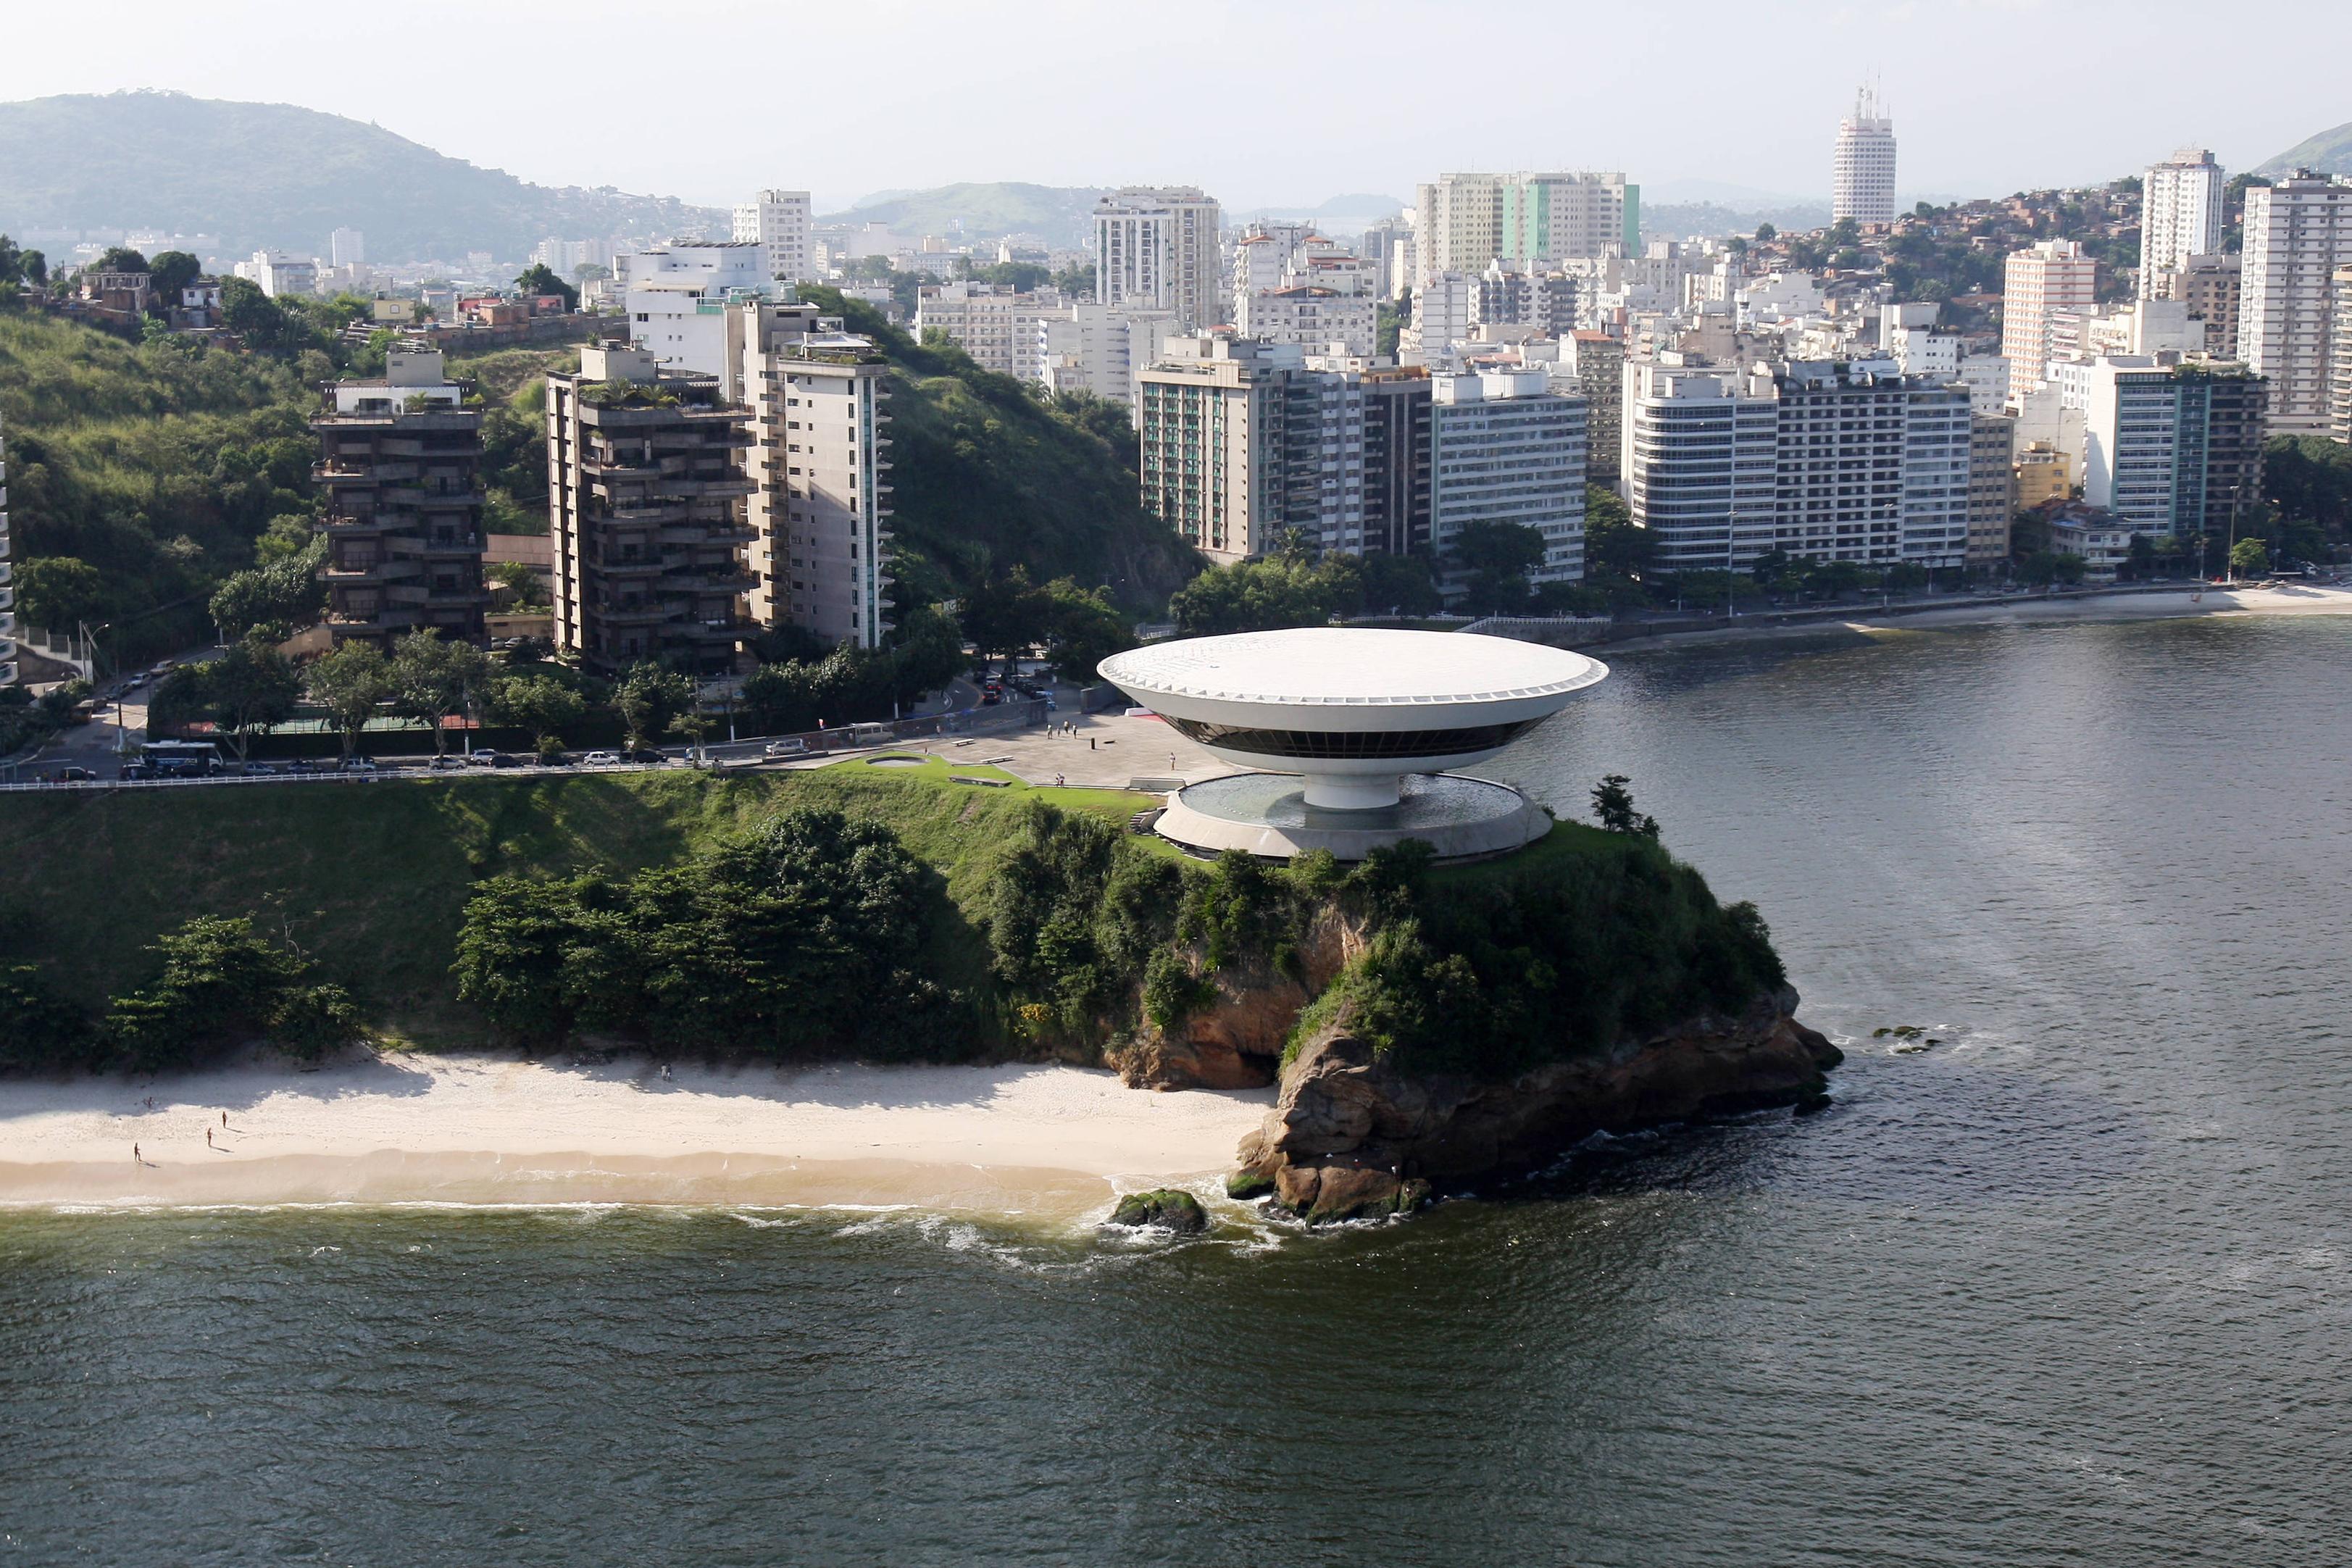 The Niteroi Museum of Contemporary Art near Rio de Janeiro, built in 1991.